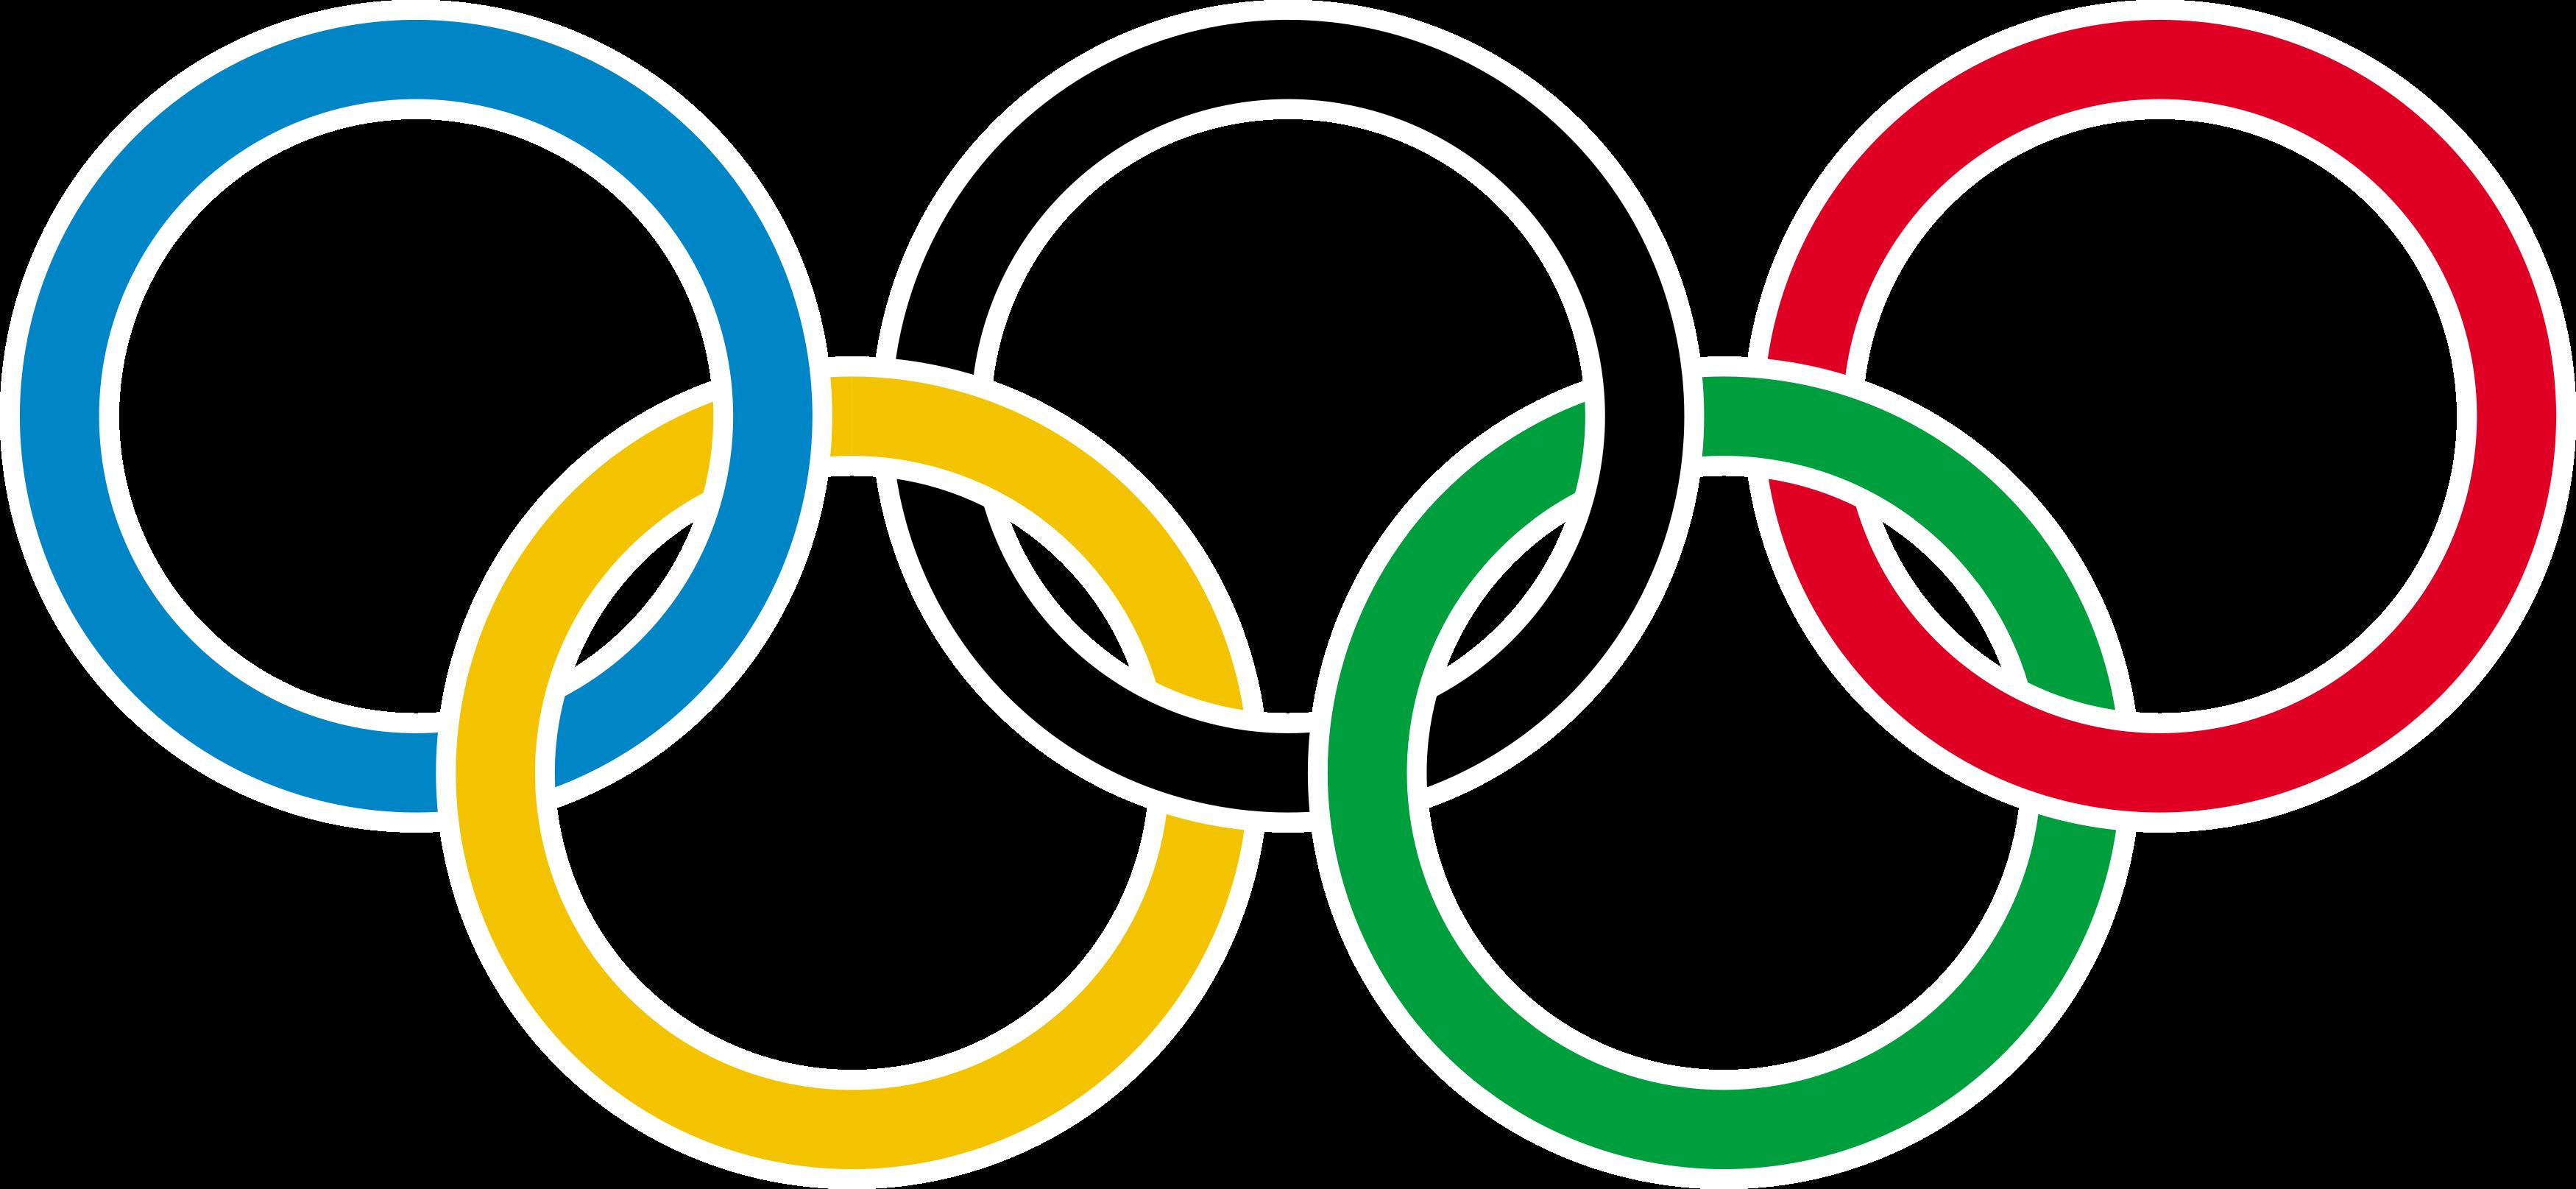 coi-logo-comite-olimpico-internacional-logo